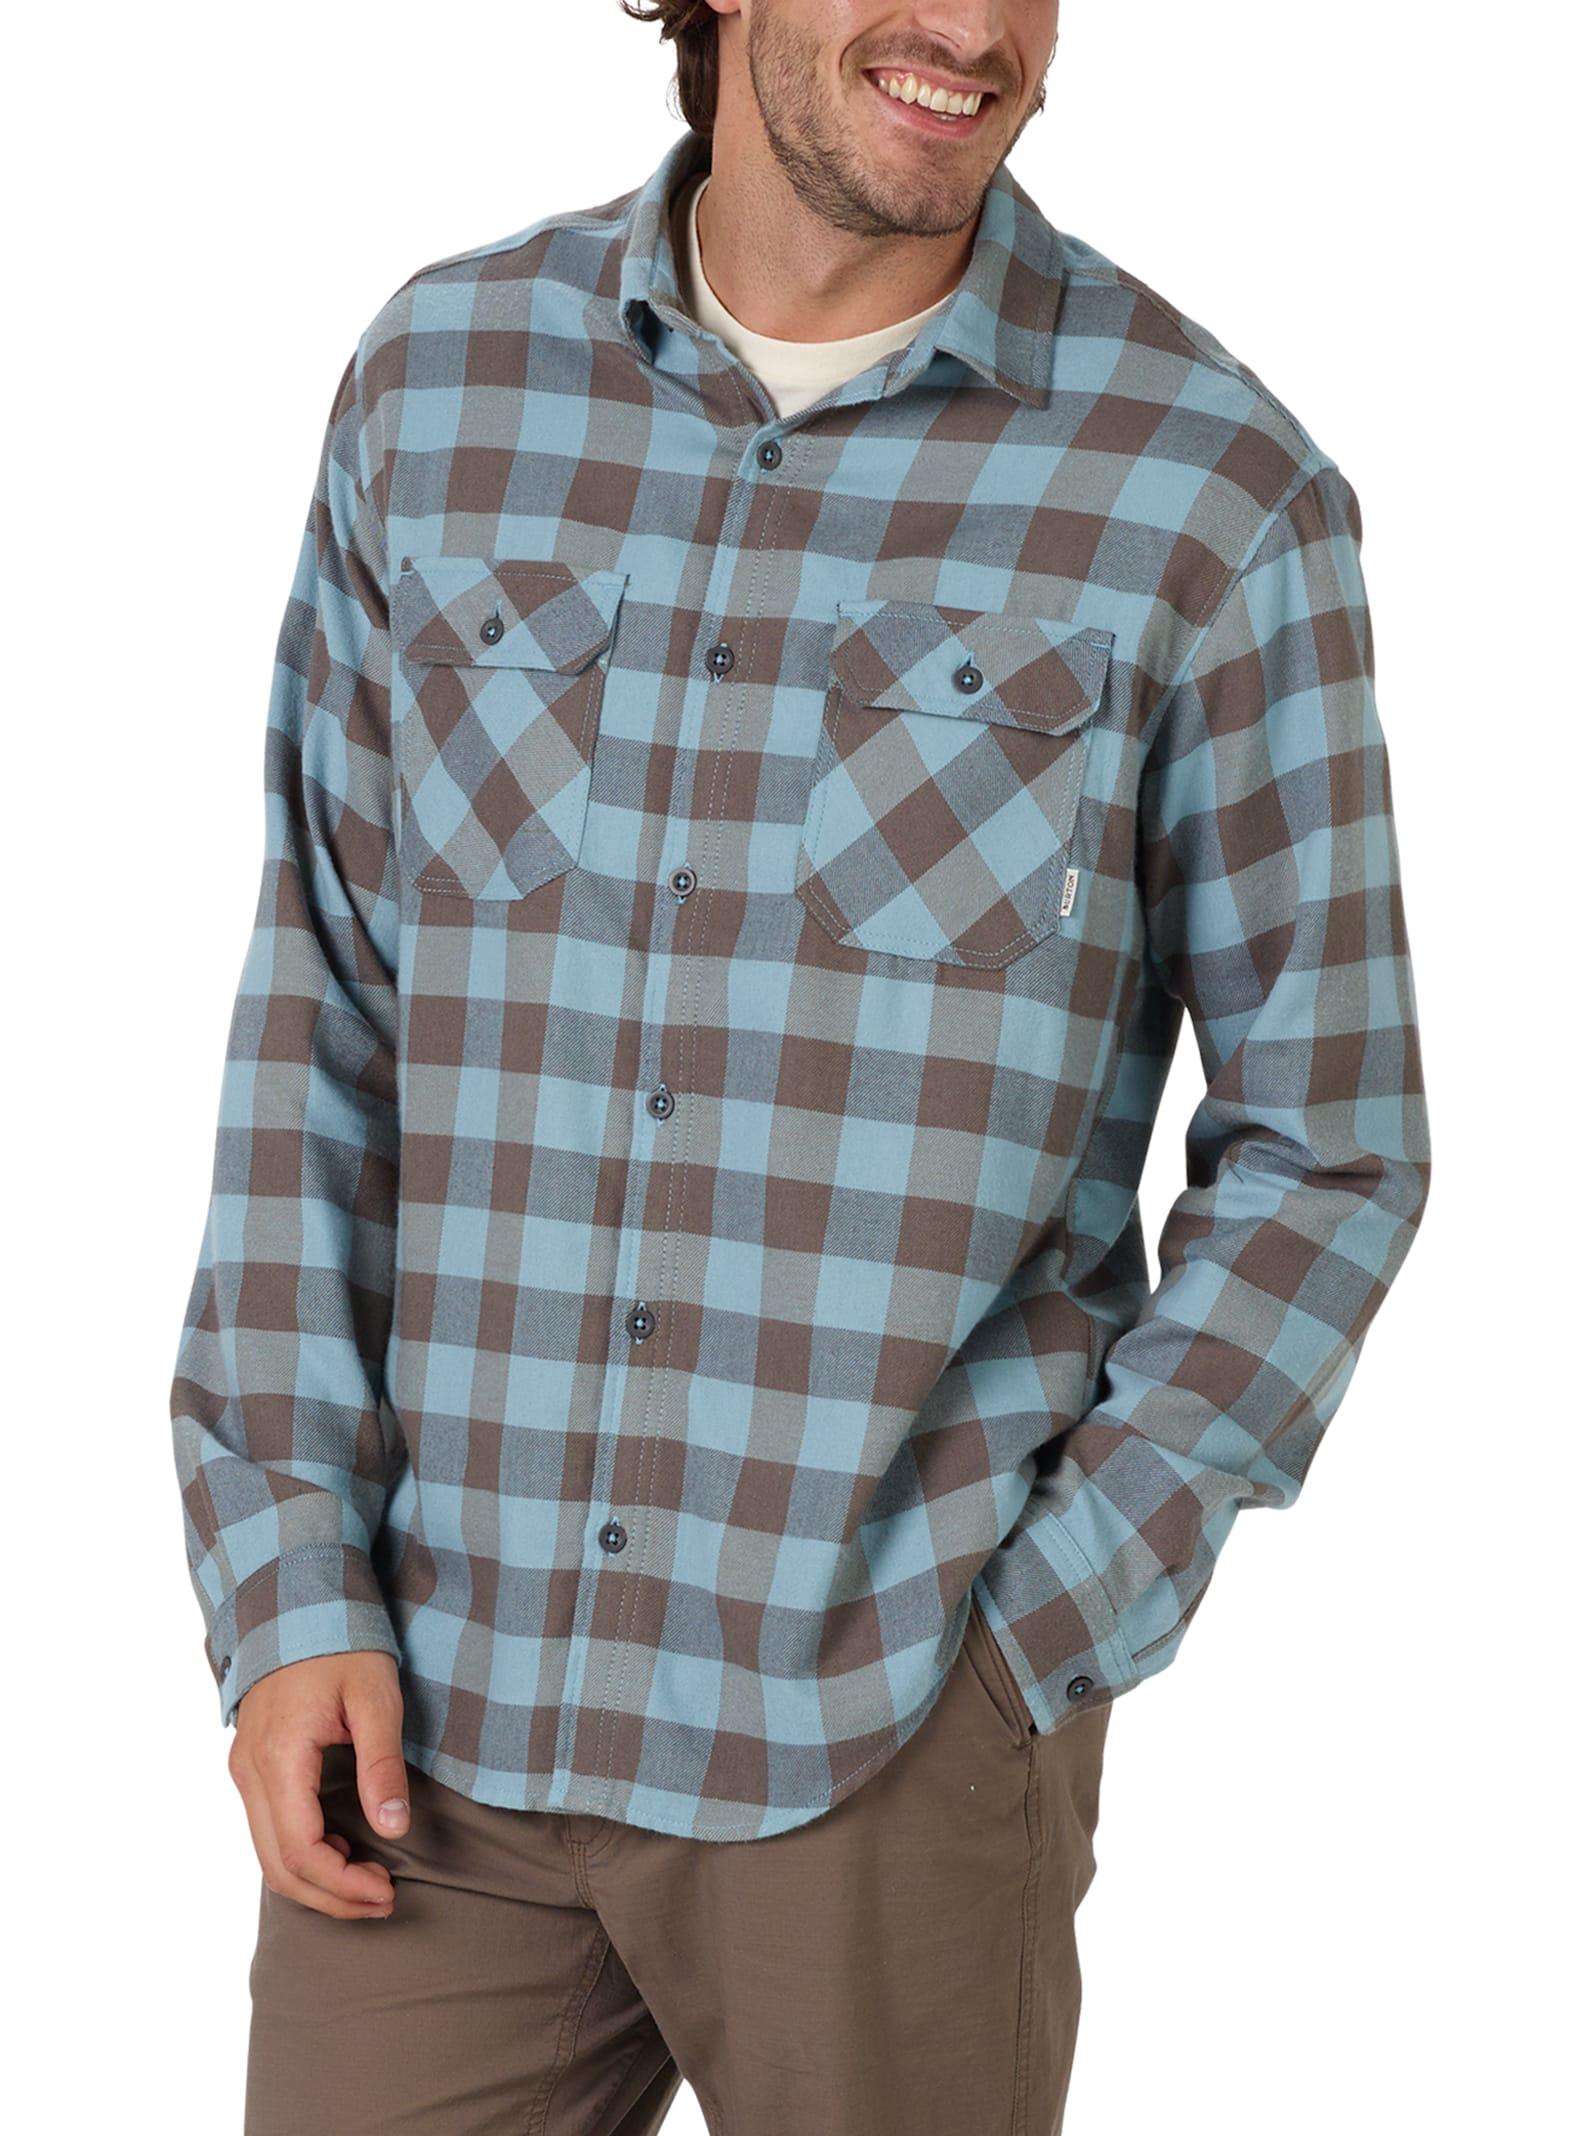 86ebd928 Men's Shirts & Flannels | Burton Snowboards